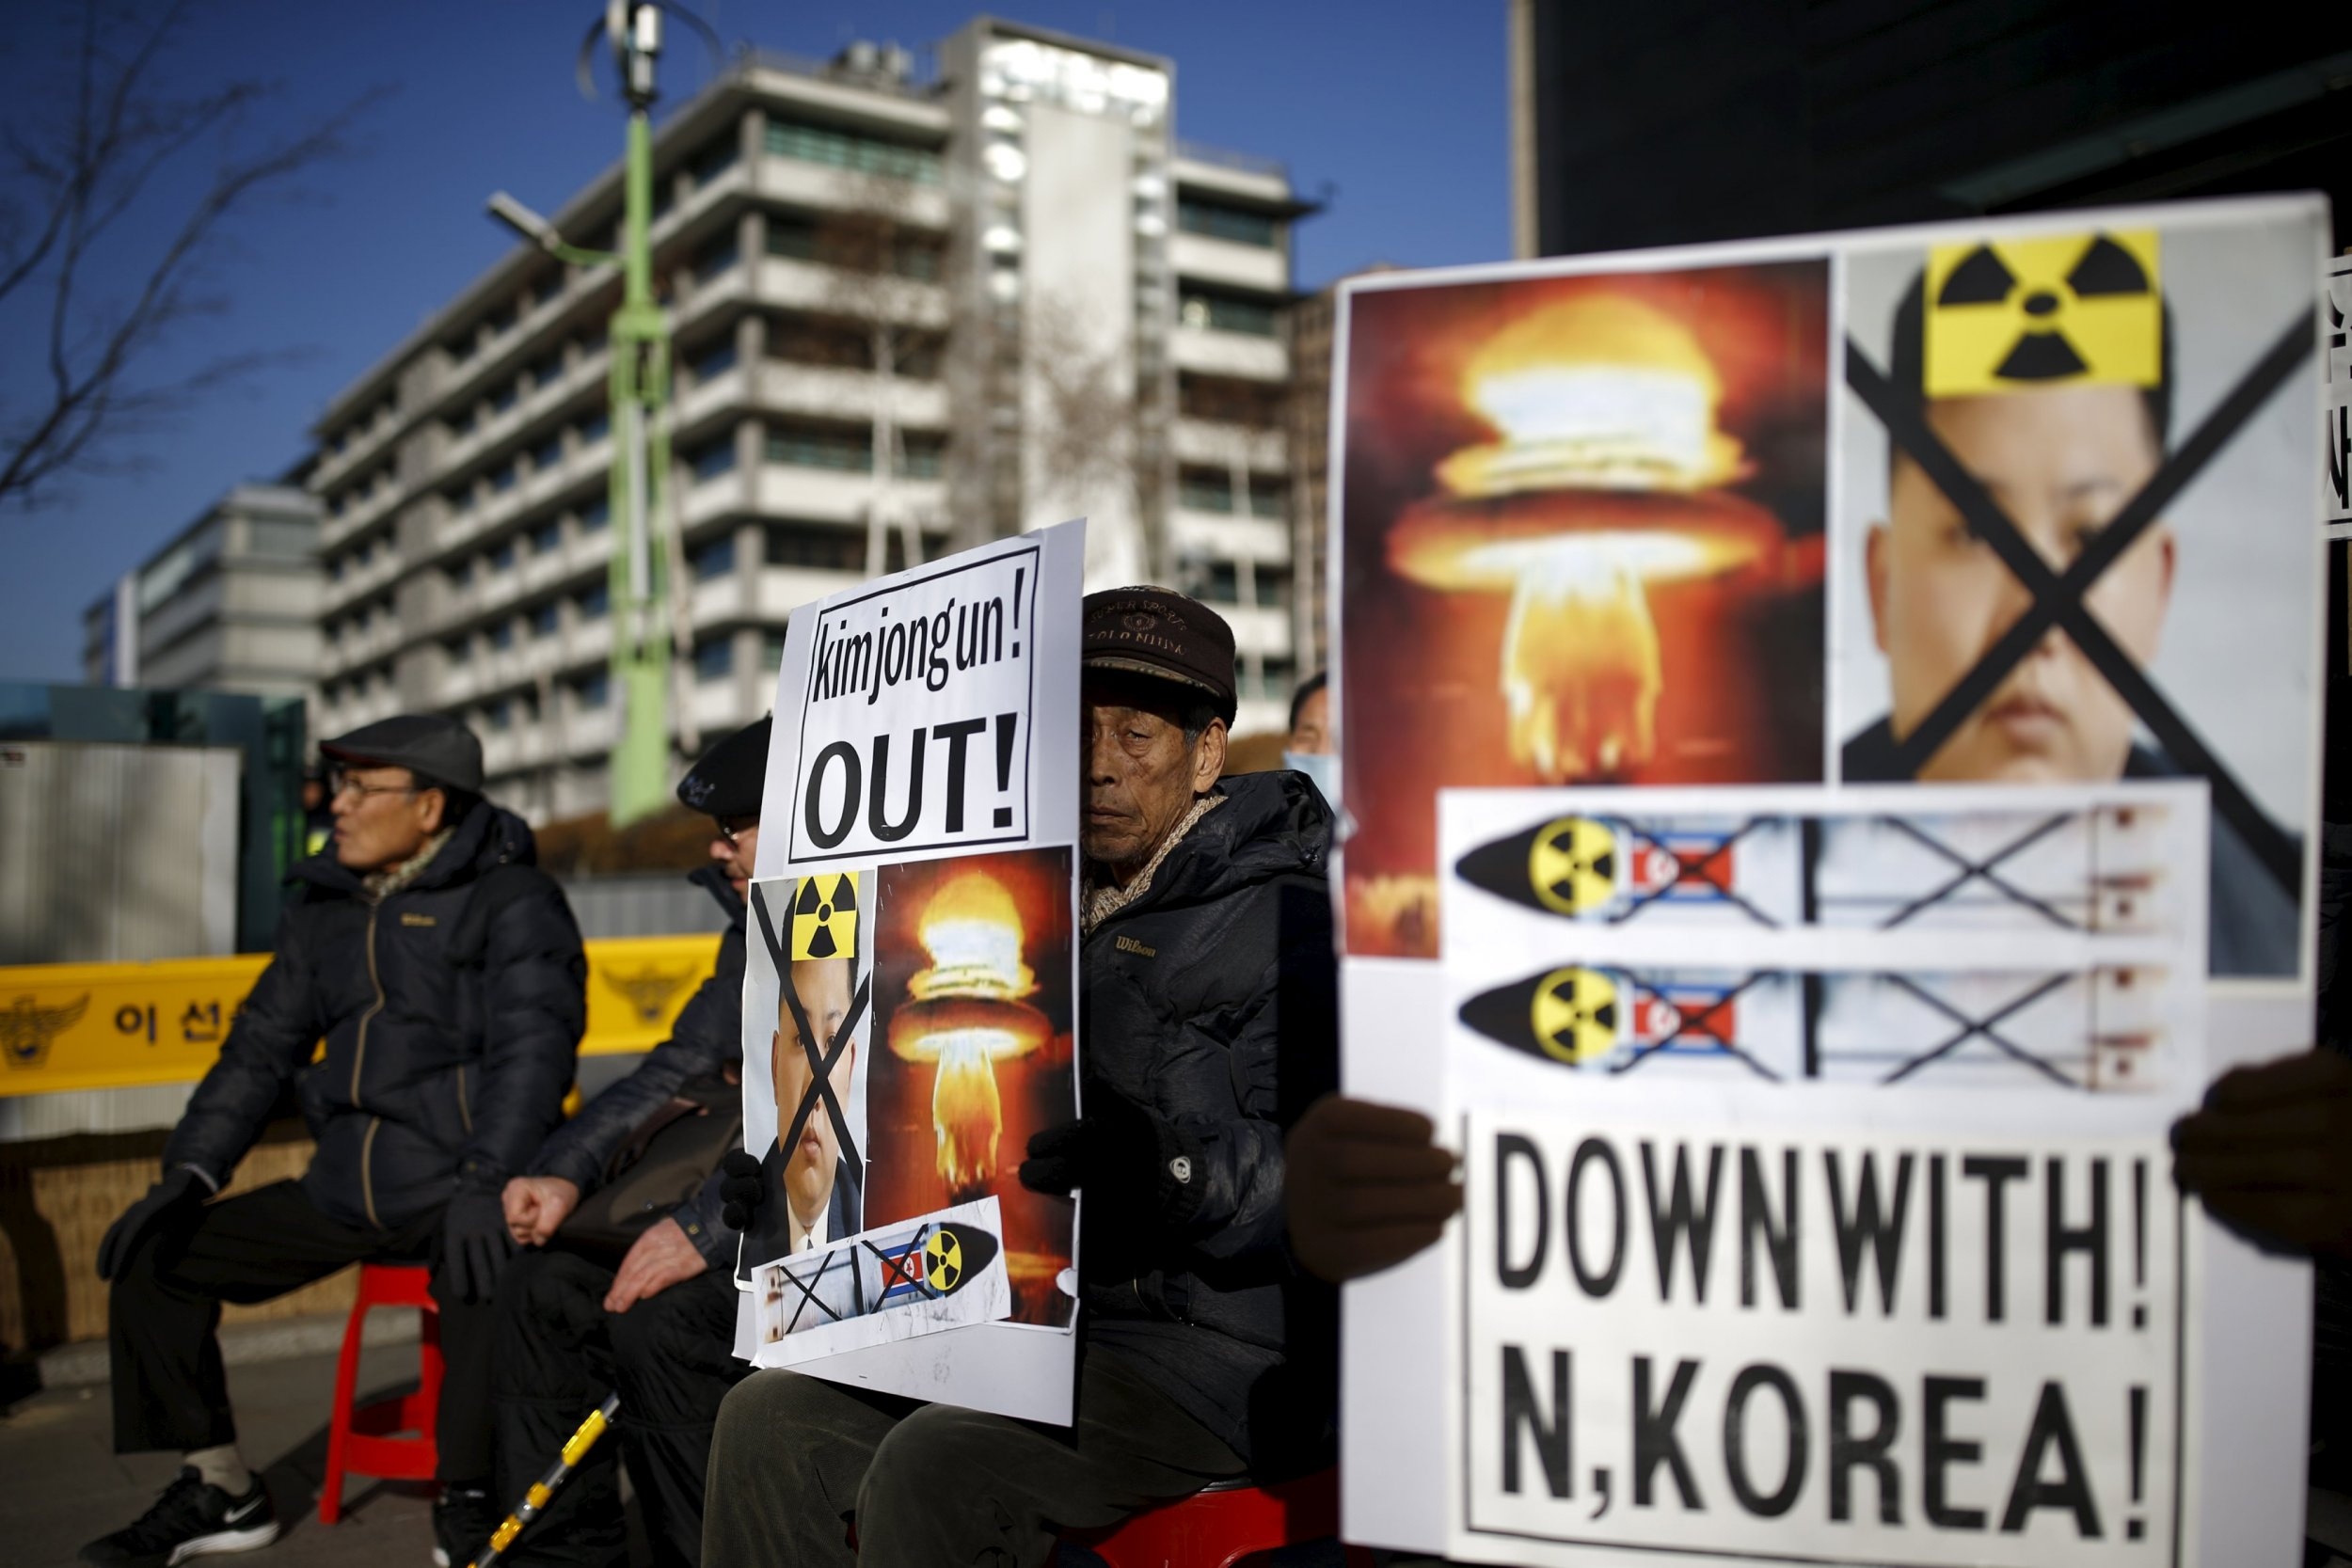 north korea broadcasts_0107